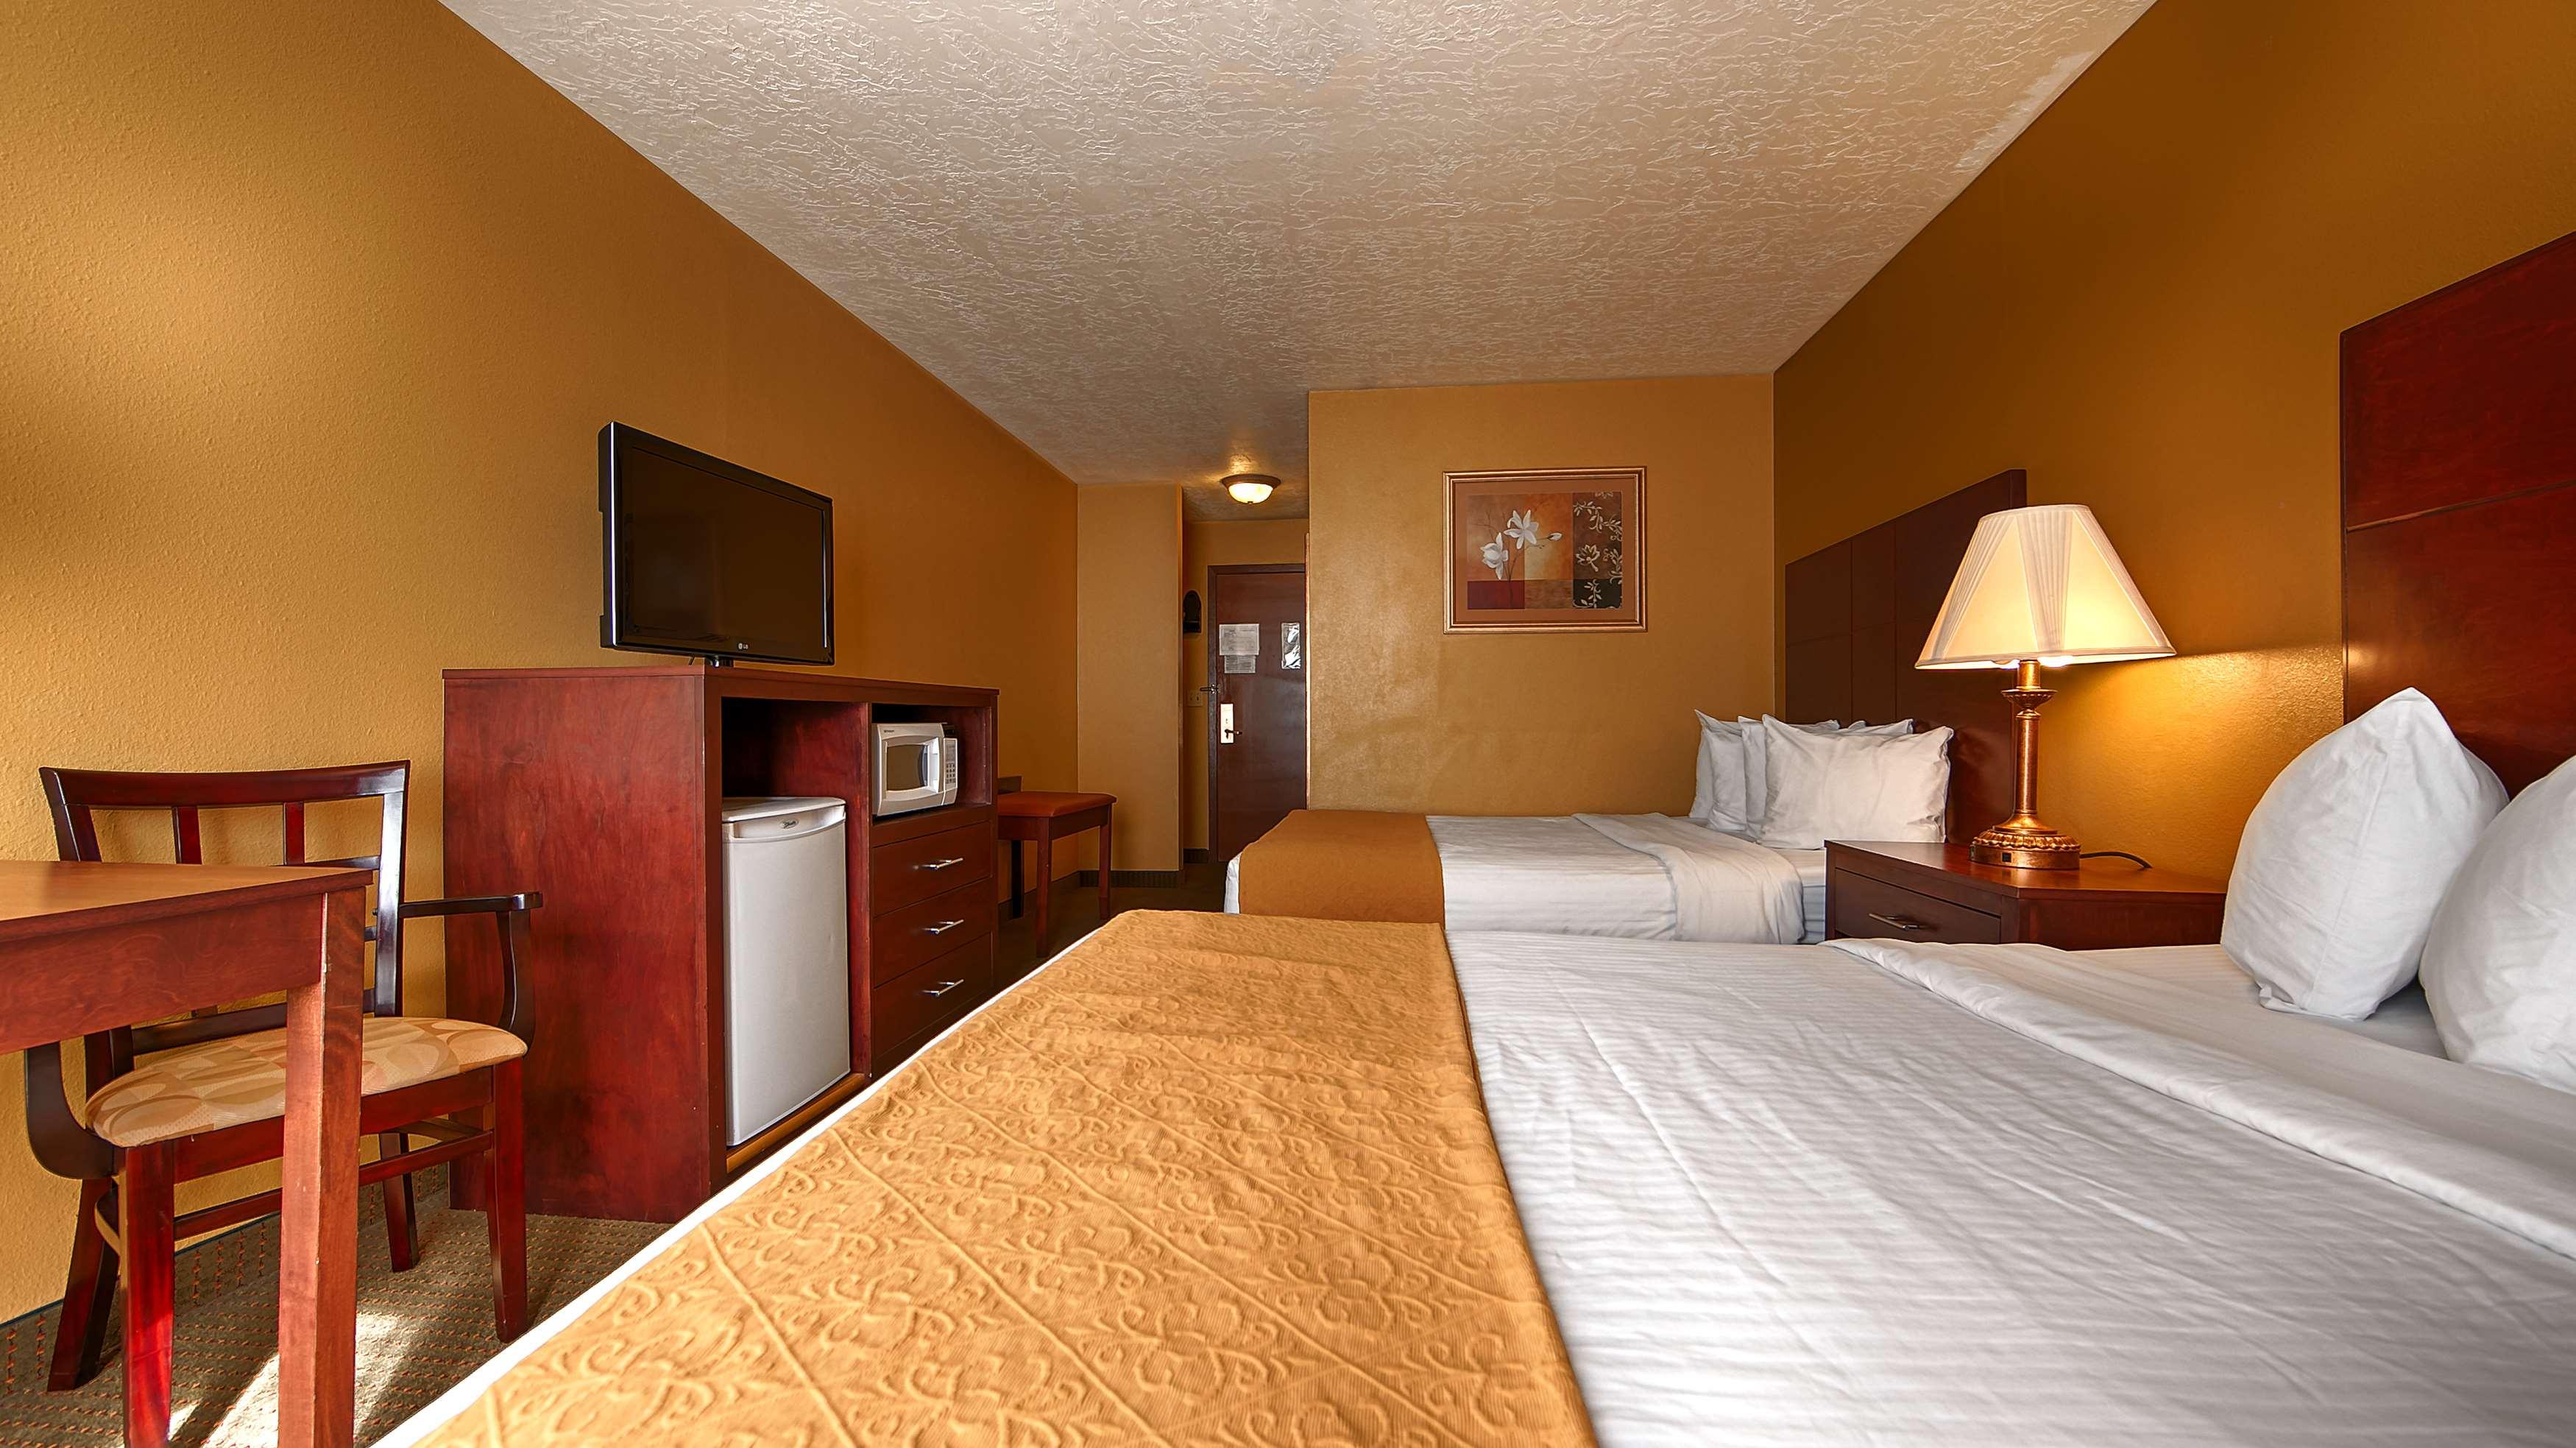 en us valley holidayinnexpress az hotel hotels by comfort express comforter green holiday tusmr airport ihg inn hoteldetail tucson